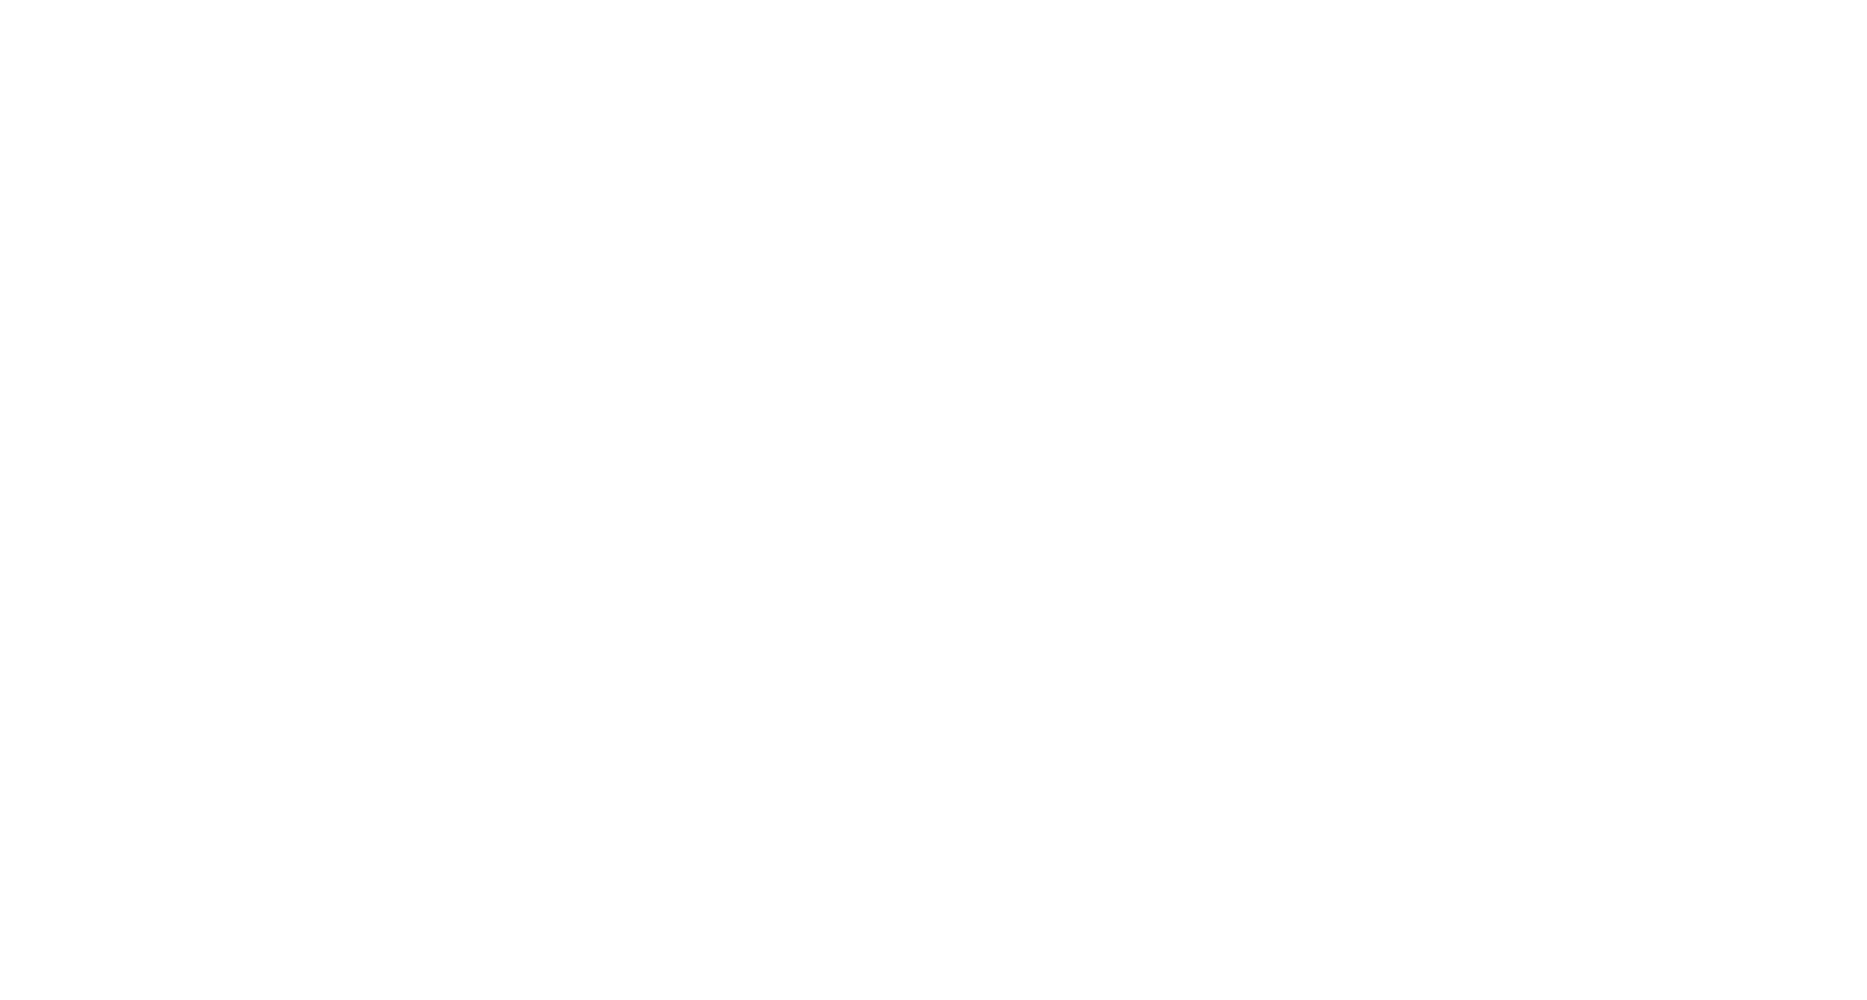 logo-zonder-vuurtoren